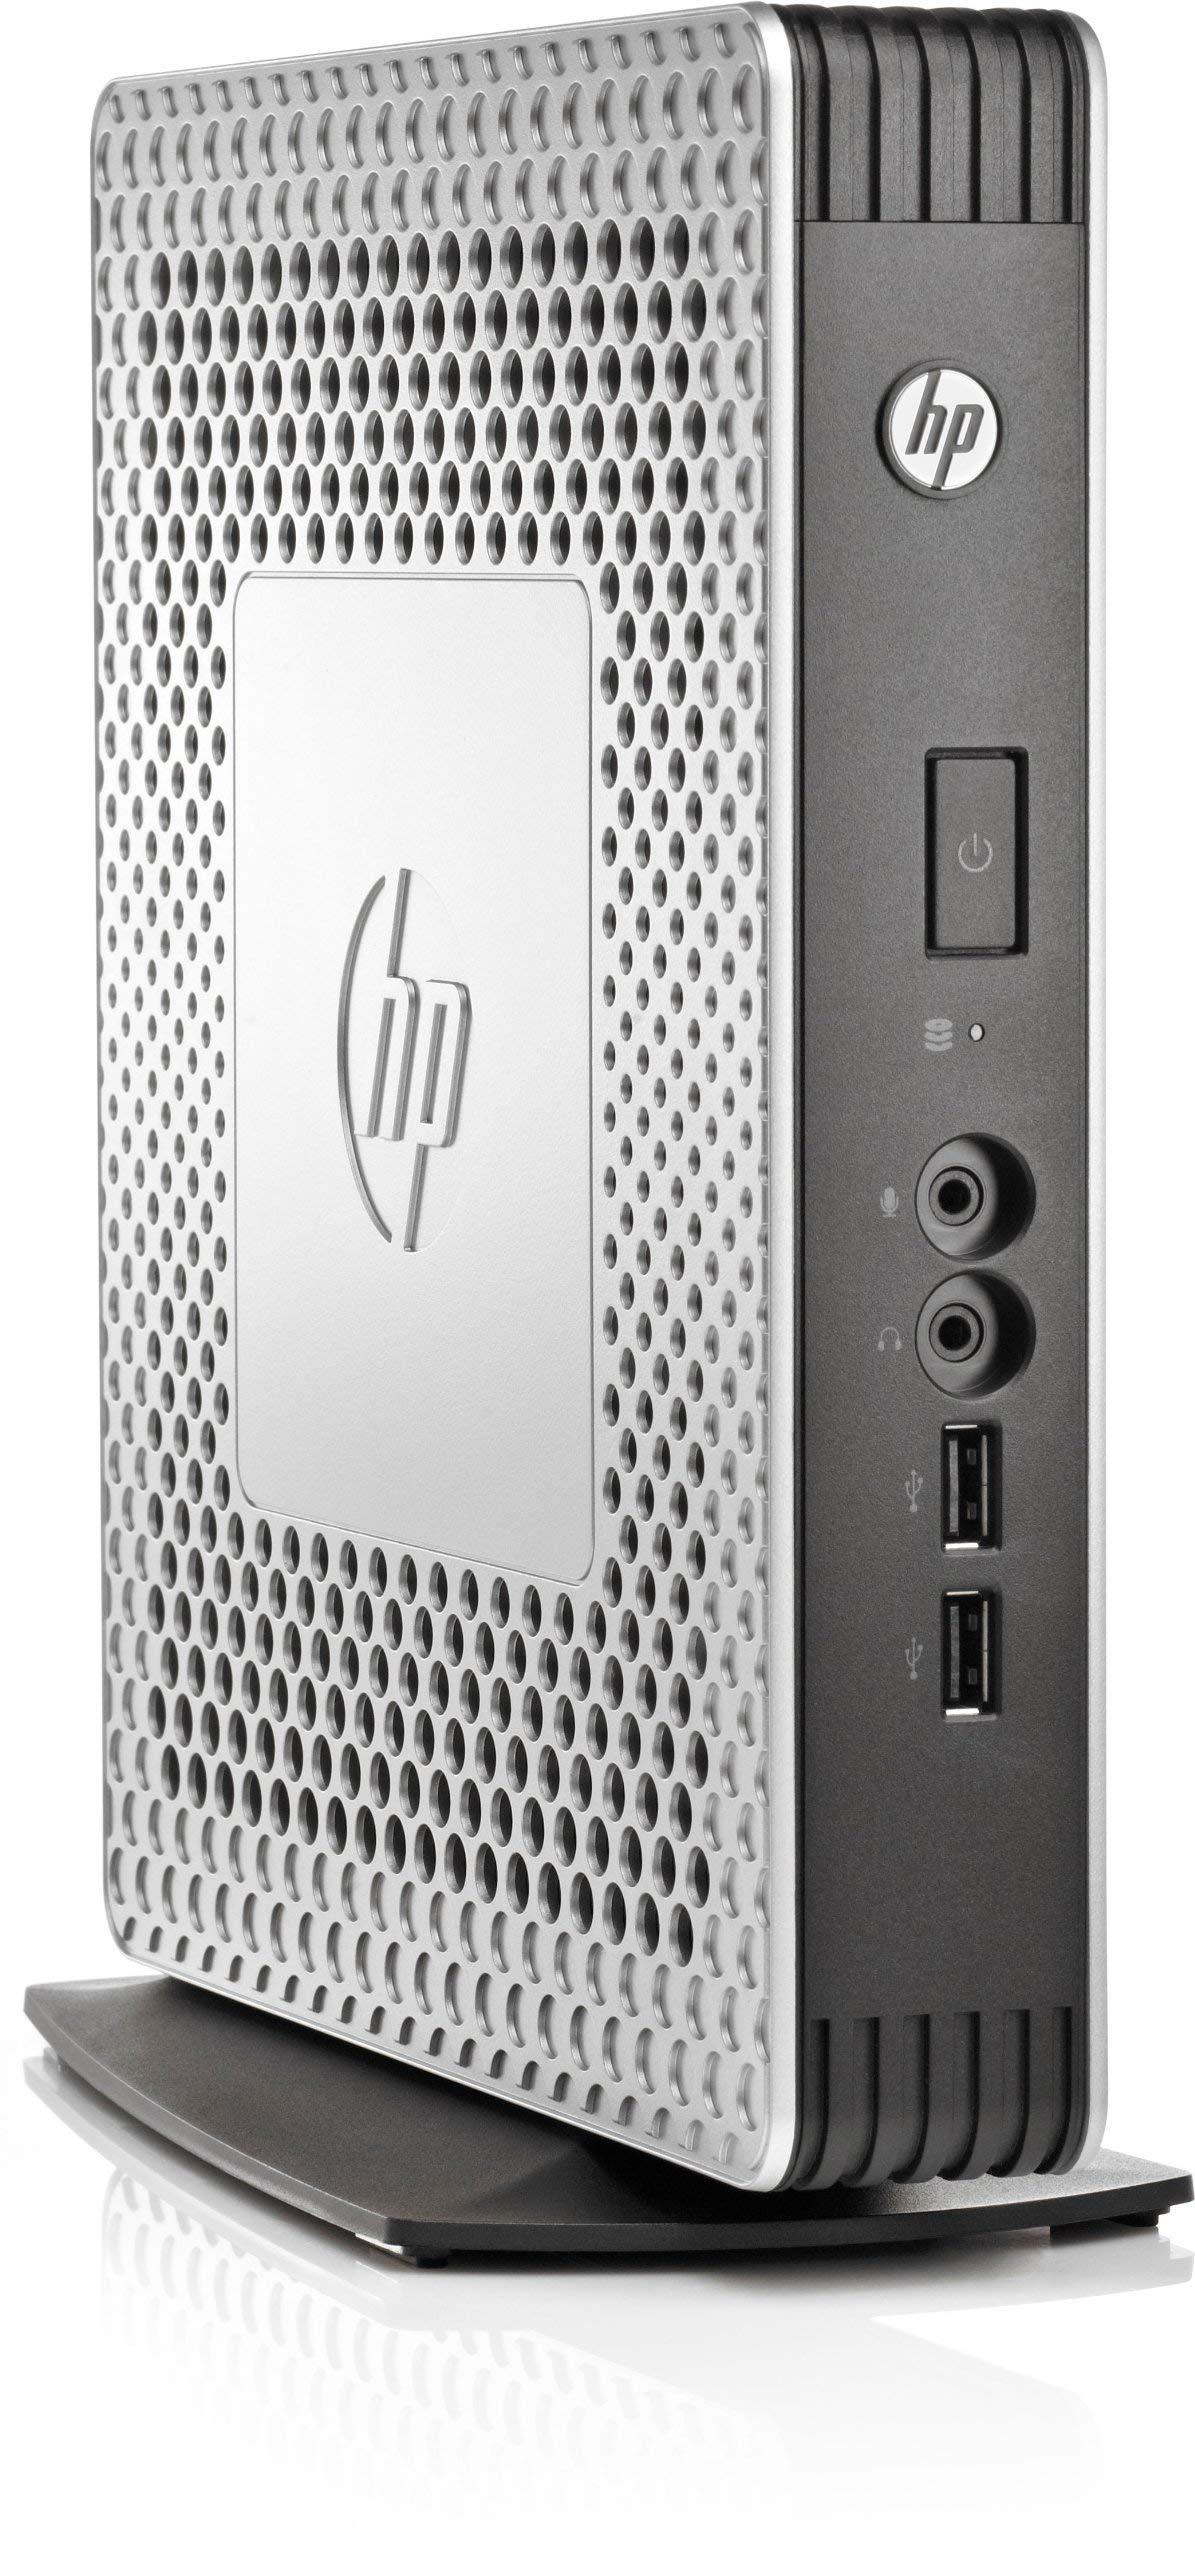 HP t610 Flexibe Client B8C95AA Thin Client - AMD G-Series T56N 1.65 GHz B8C95AA#ABA (Renewed)